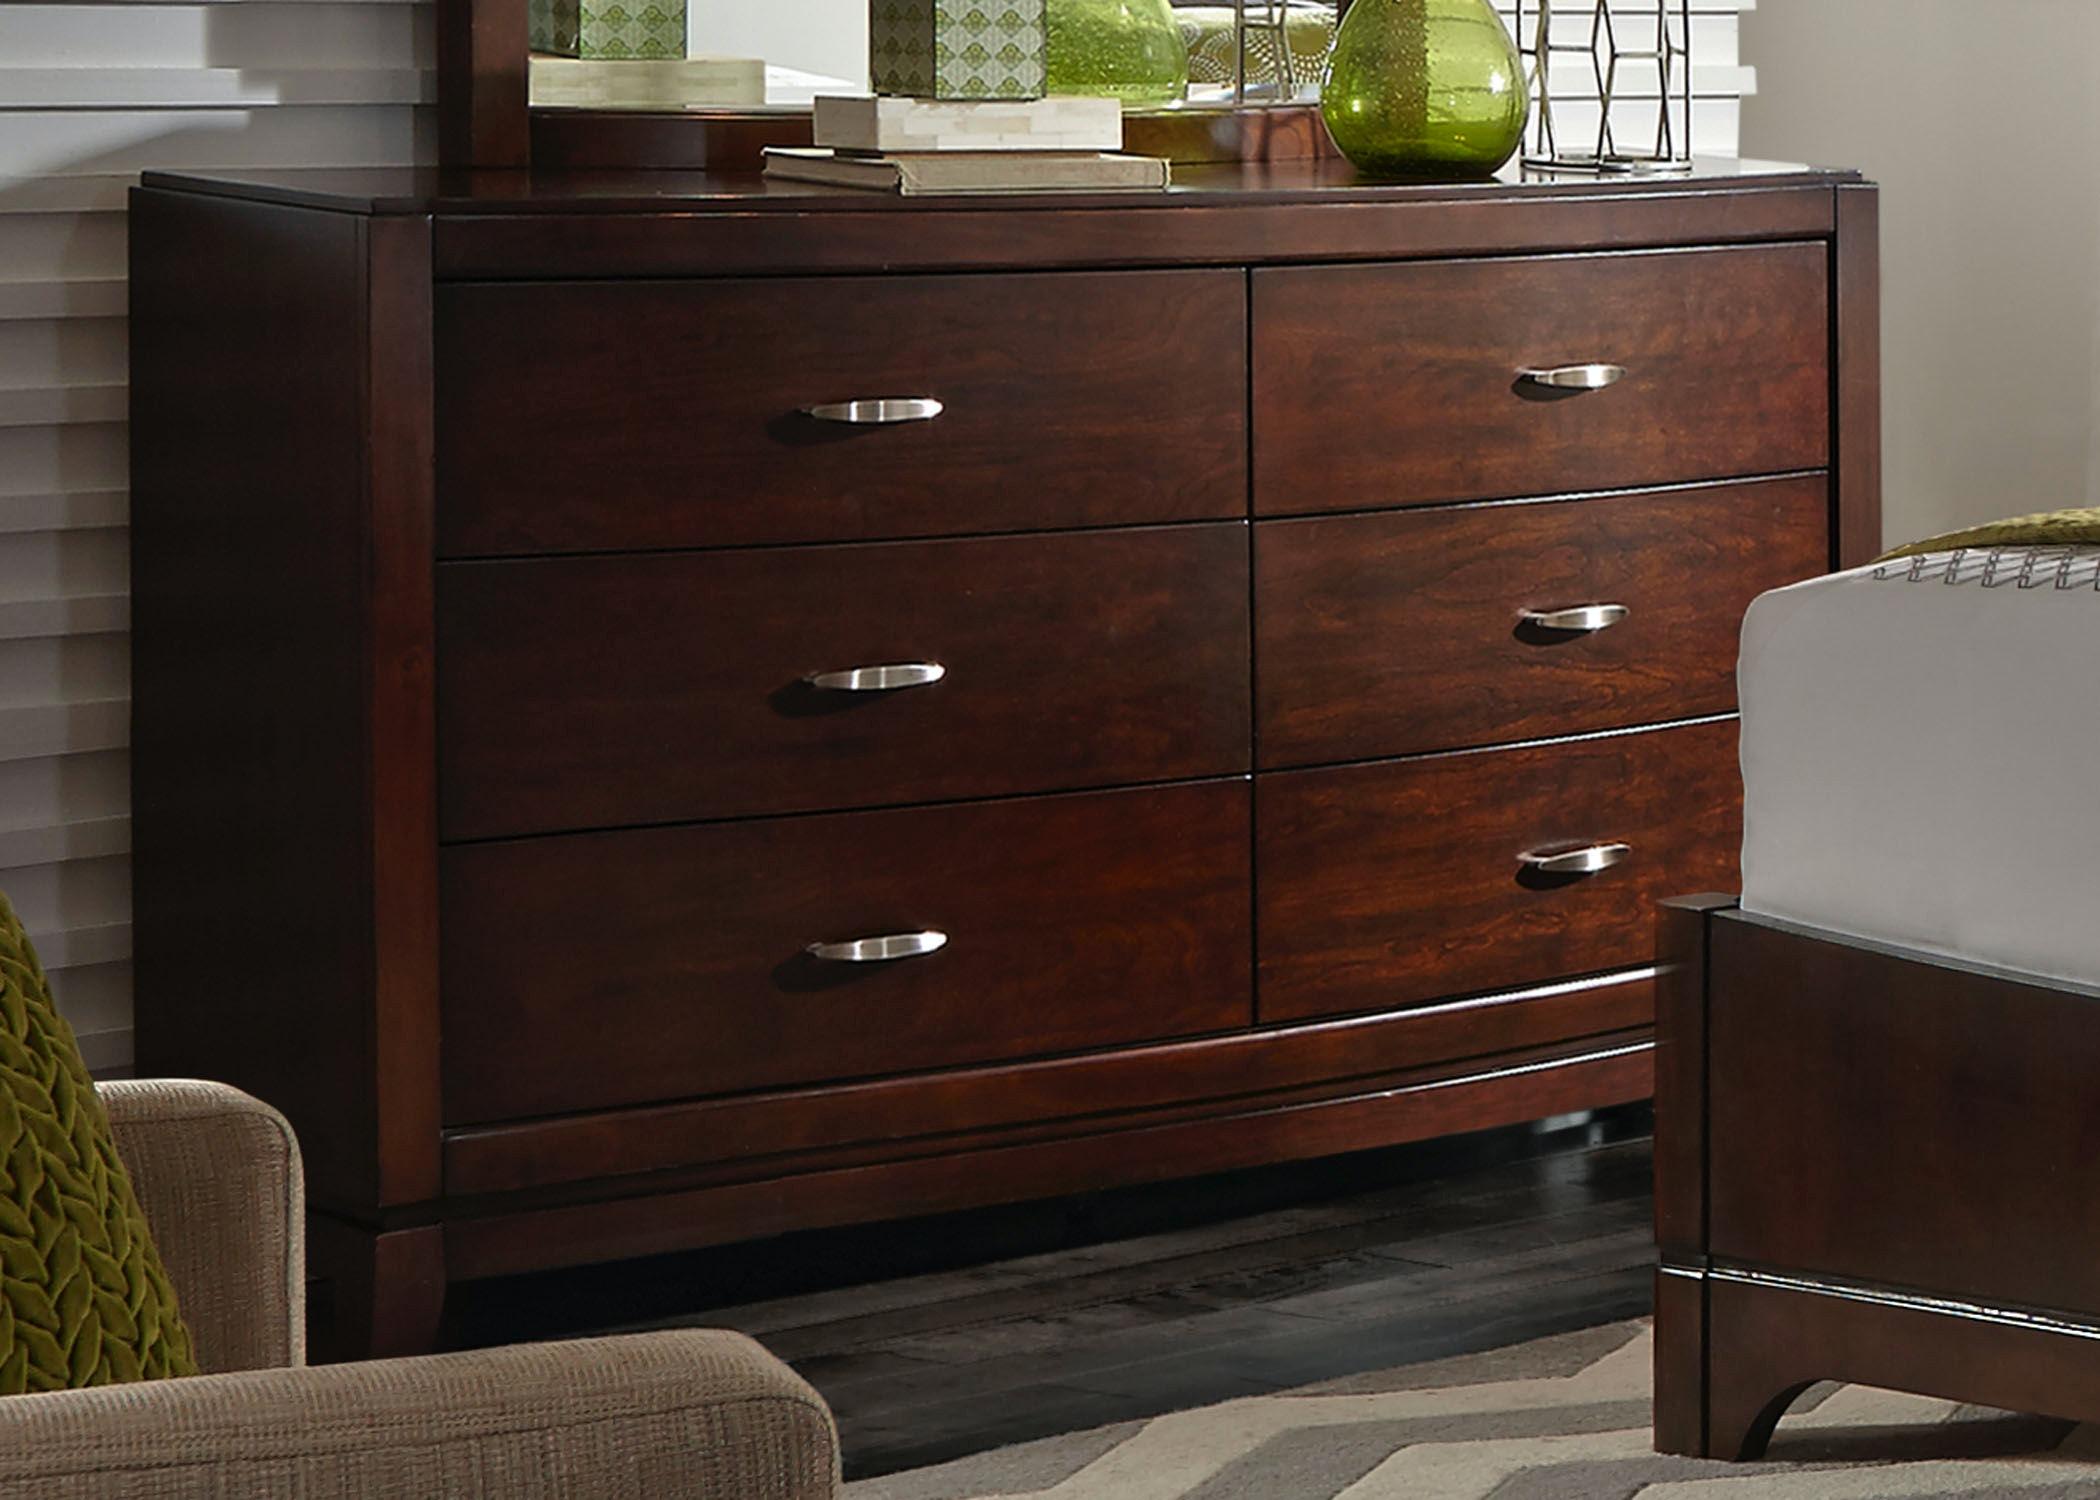 Liberty Furniture 6 Drawer Dresser 505 BR31